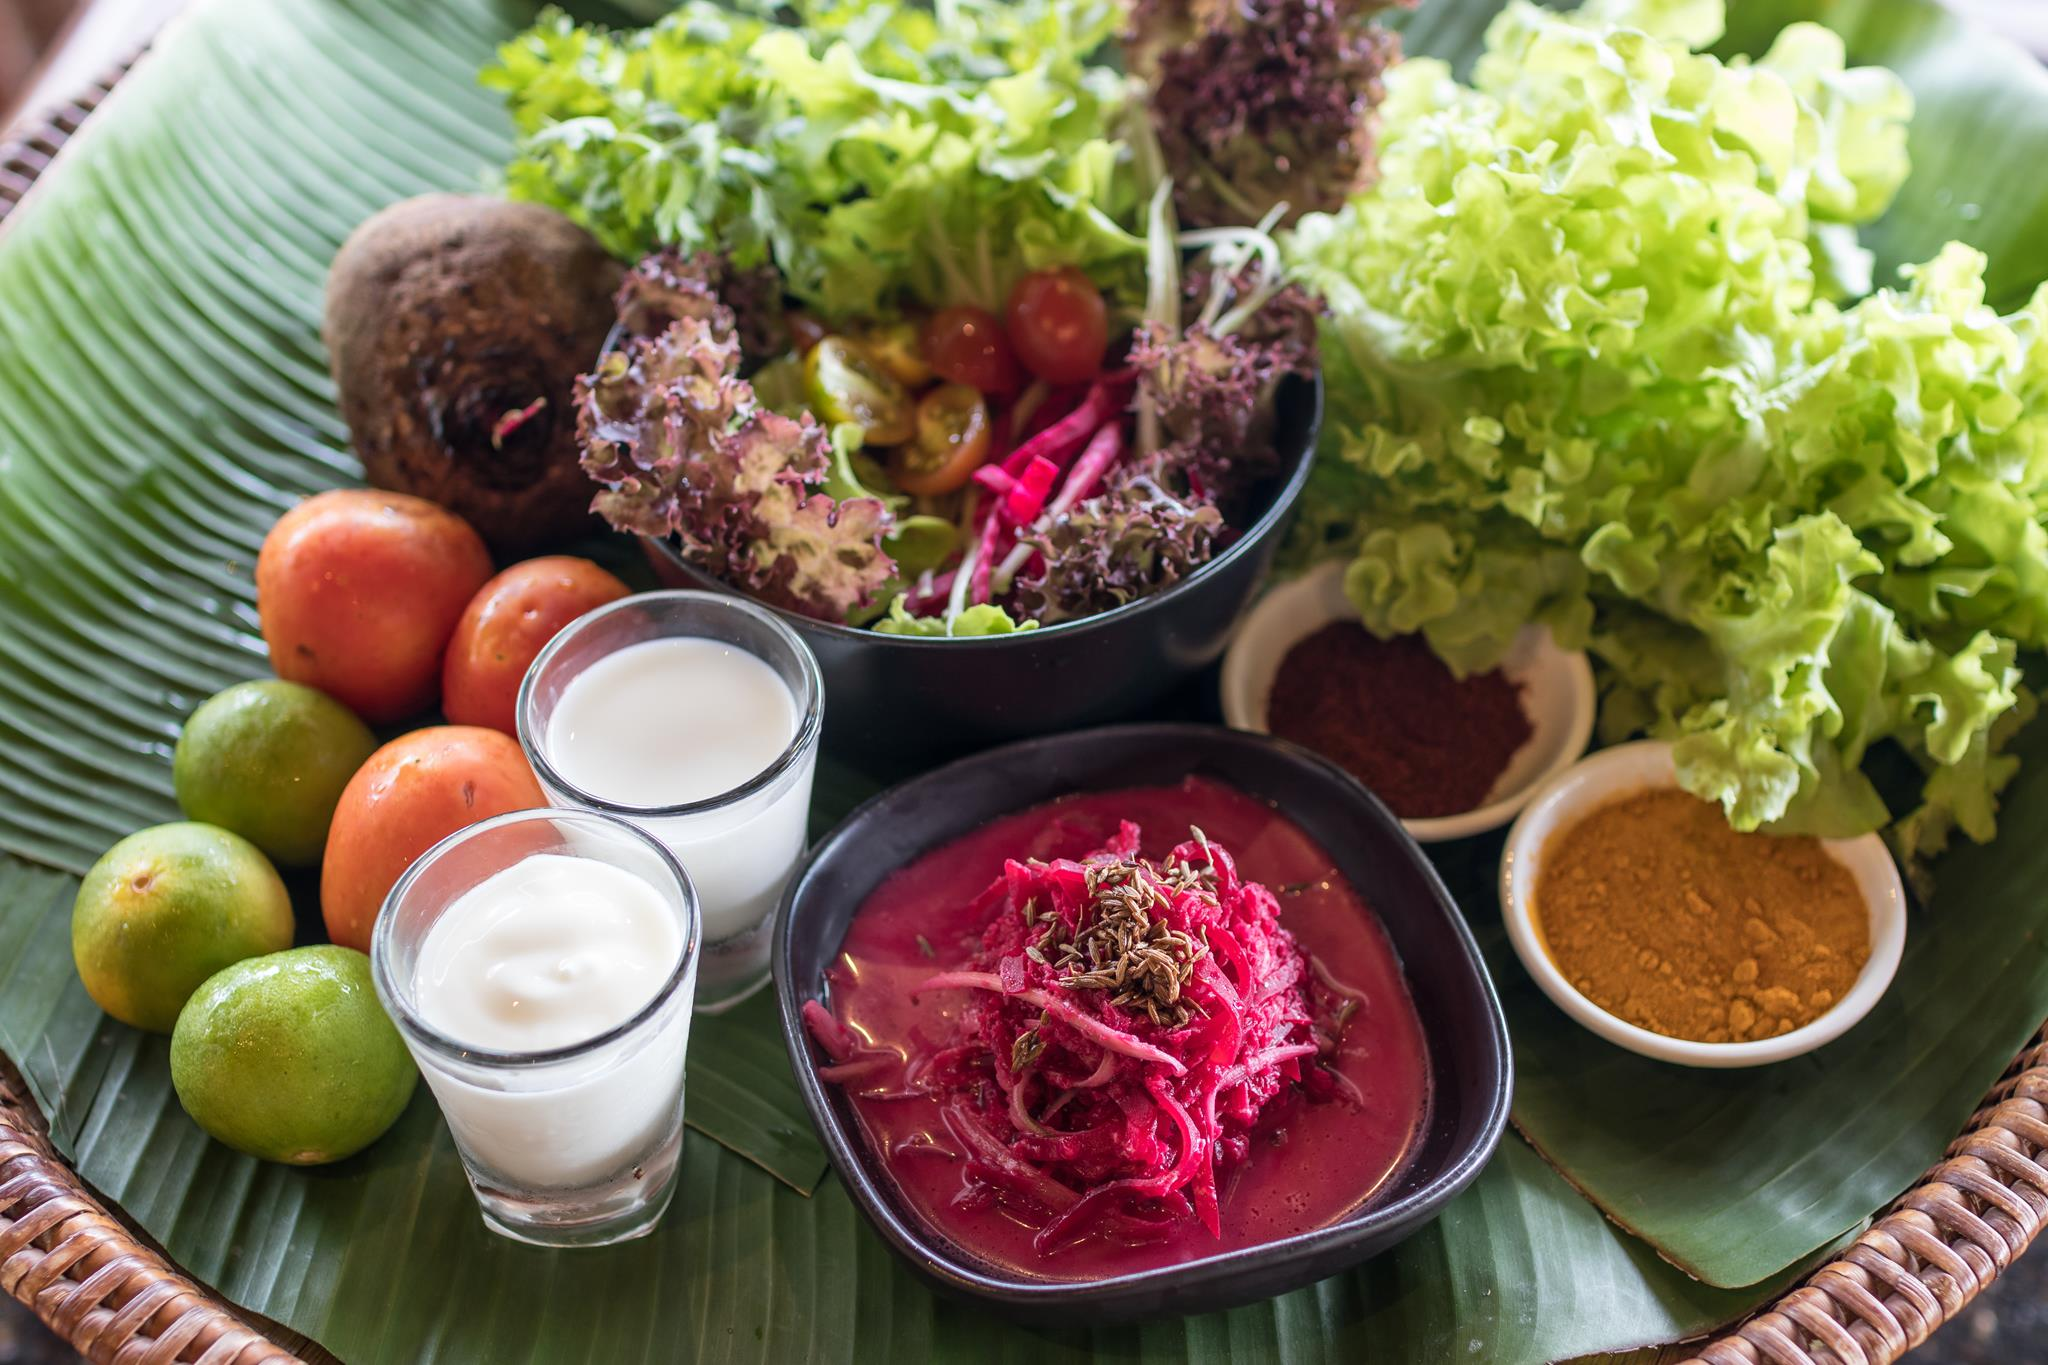 Fresh Summer Vegetable Salad made by Mangosteen Ayurveda & Wellness Resort, Rawai - Phuket!